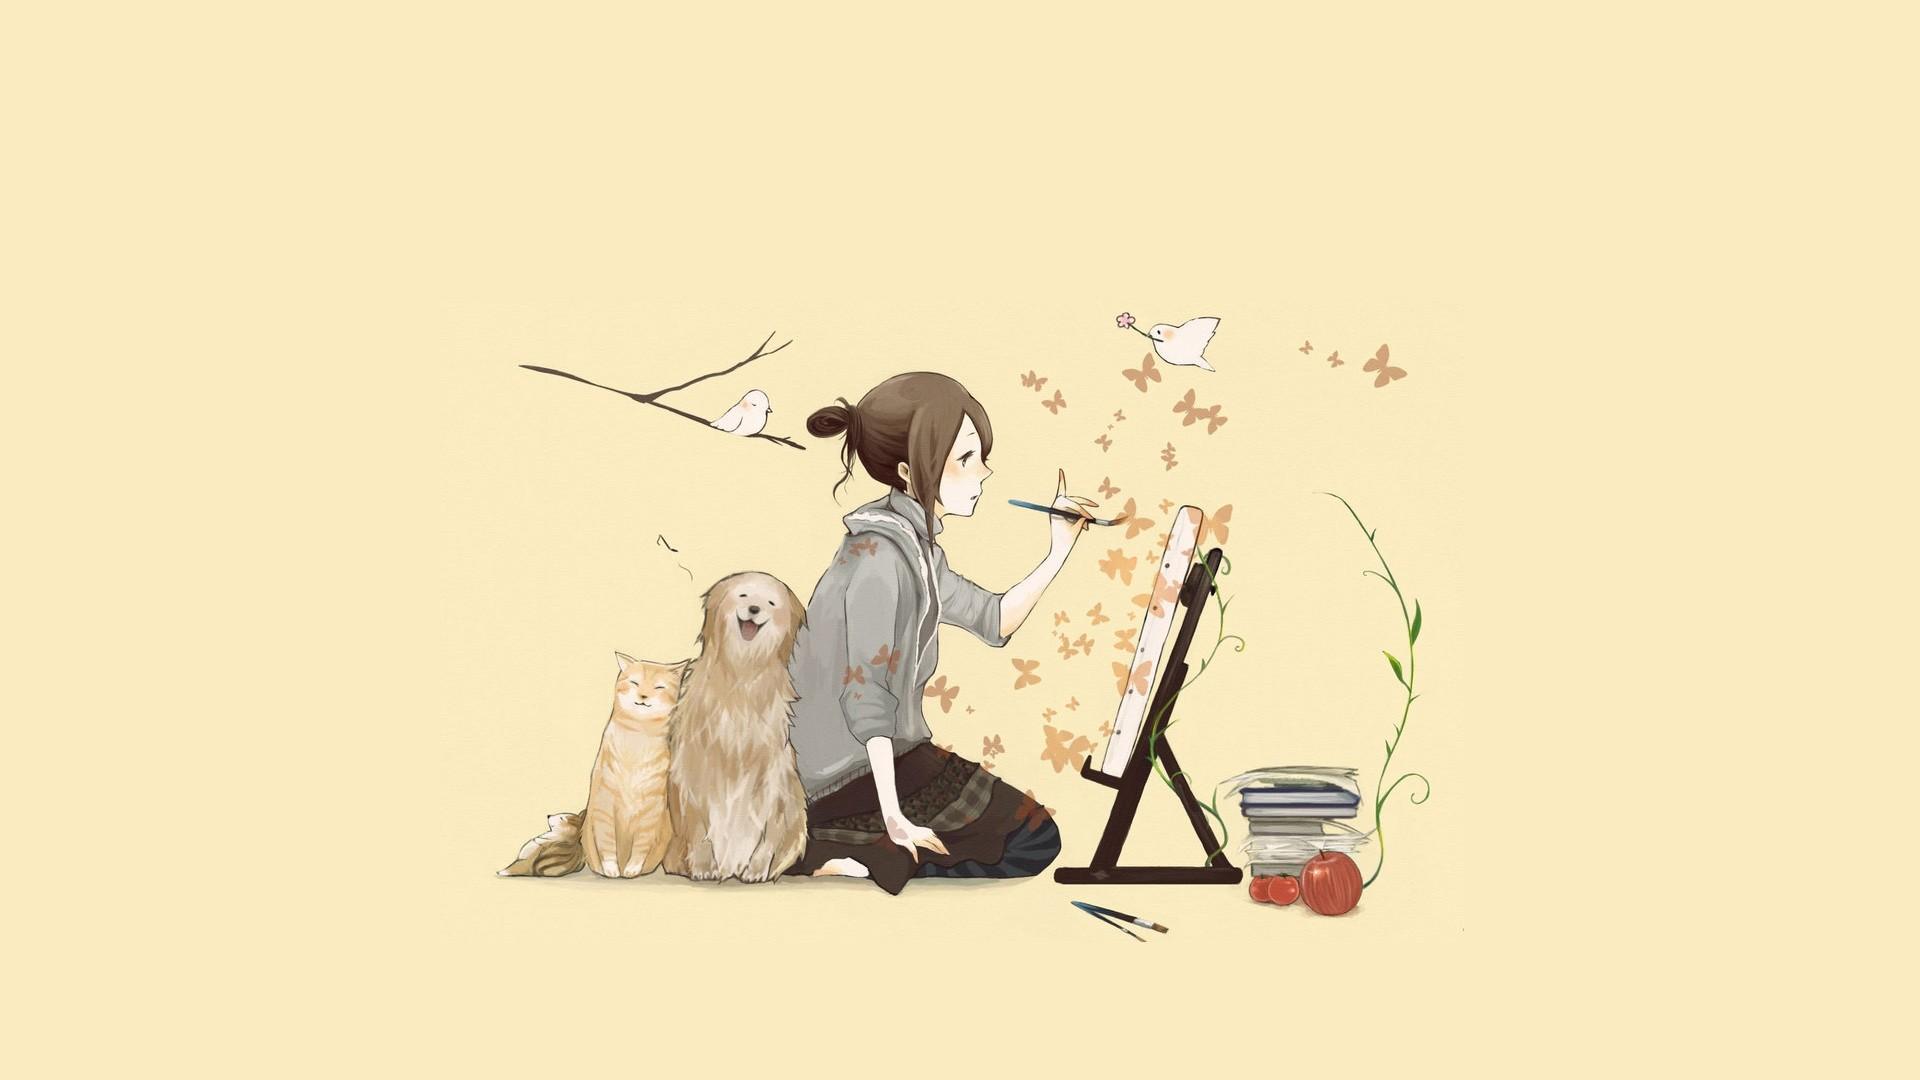 Digital Art Original Characters Painting Dog Cats 1920x1080